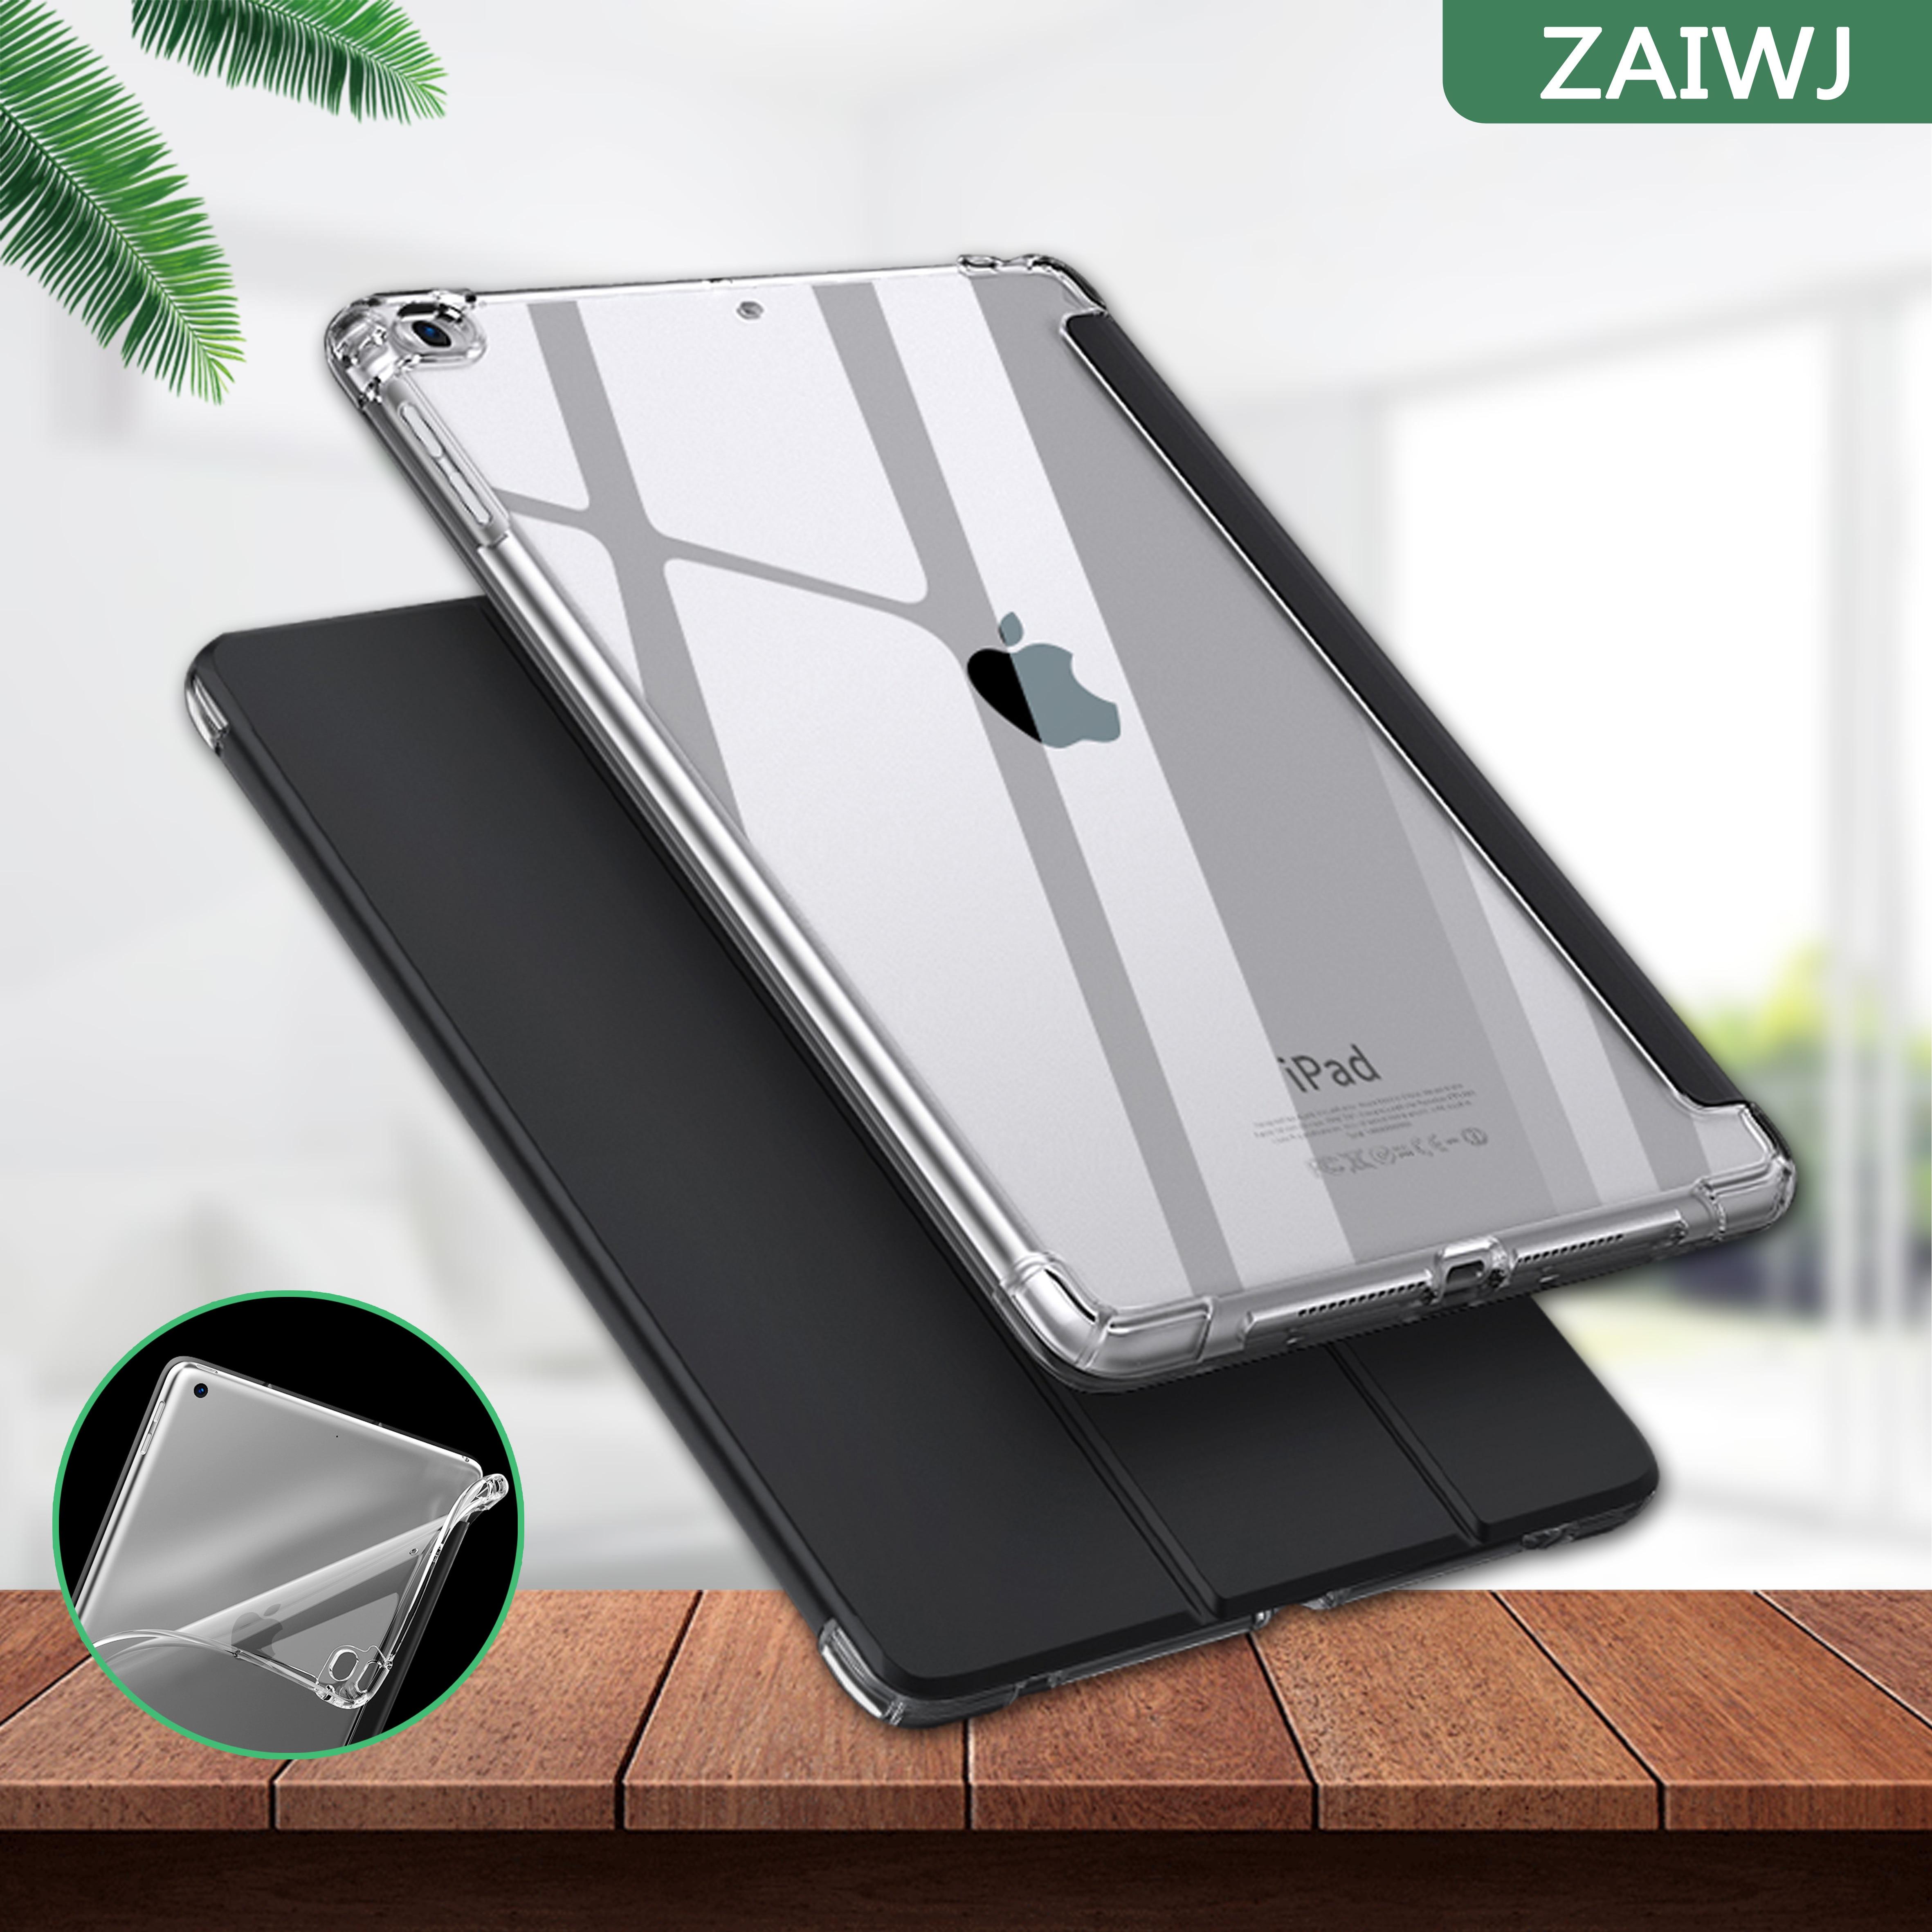 Для iPad Air 4 10,9 чехол Pro 11 Air 3 10,5 дюймов 10,2 2019 2020/9,7 2018 Крышка для 6th 7th 8th поколения мини на возраст 1, 2, 3, 4, 5, оболочки